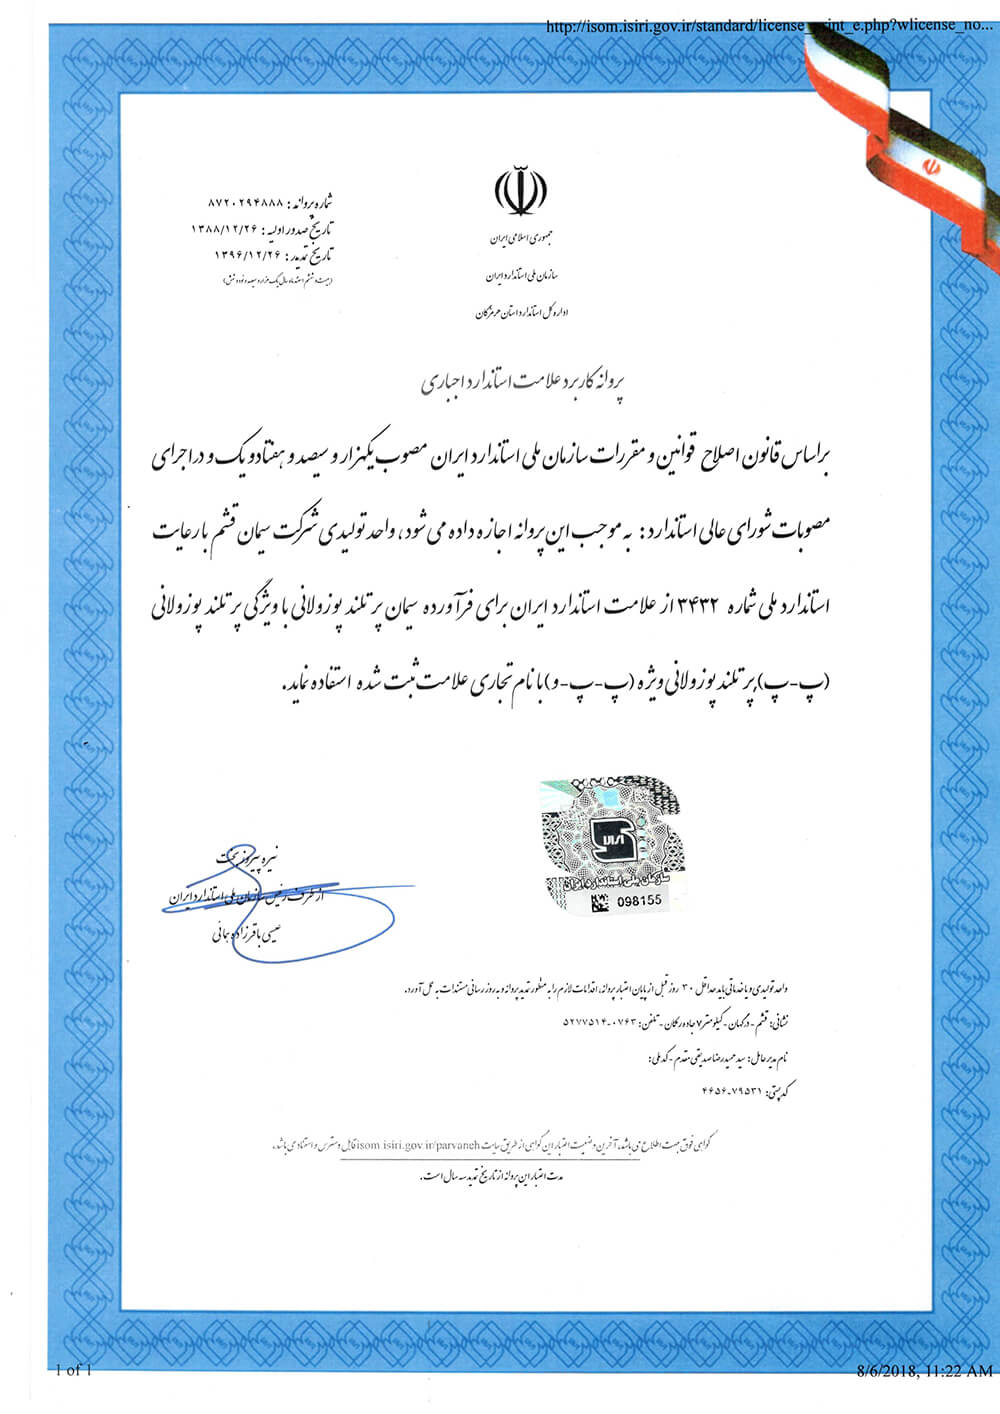 CN20002-IR Qeshm Cememt Co-1(2)